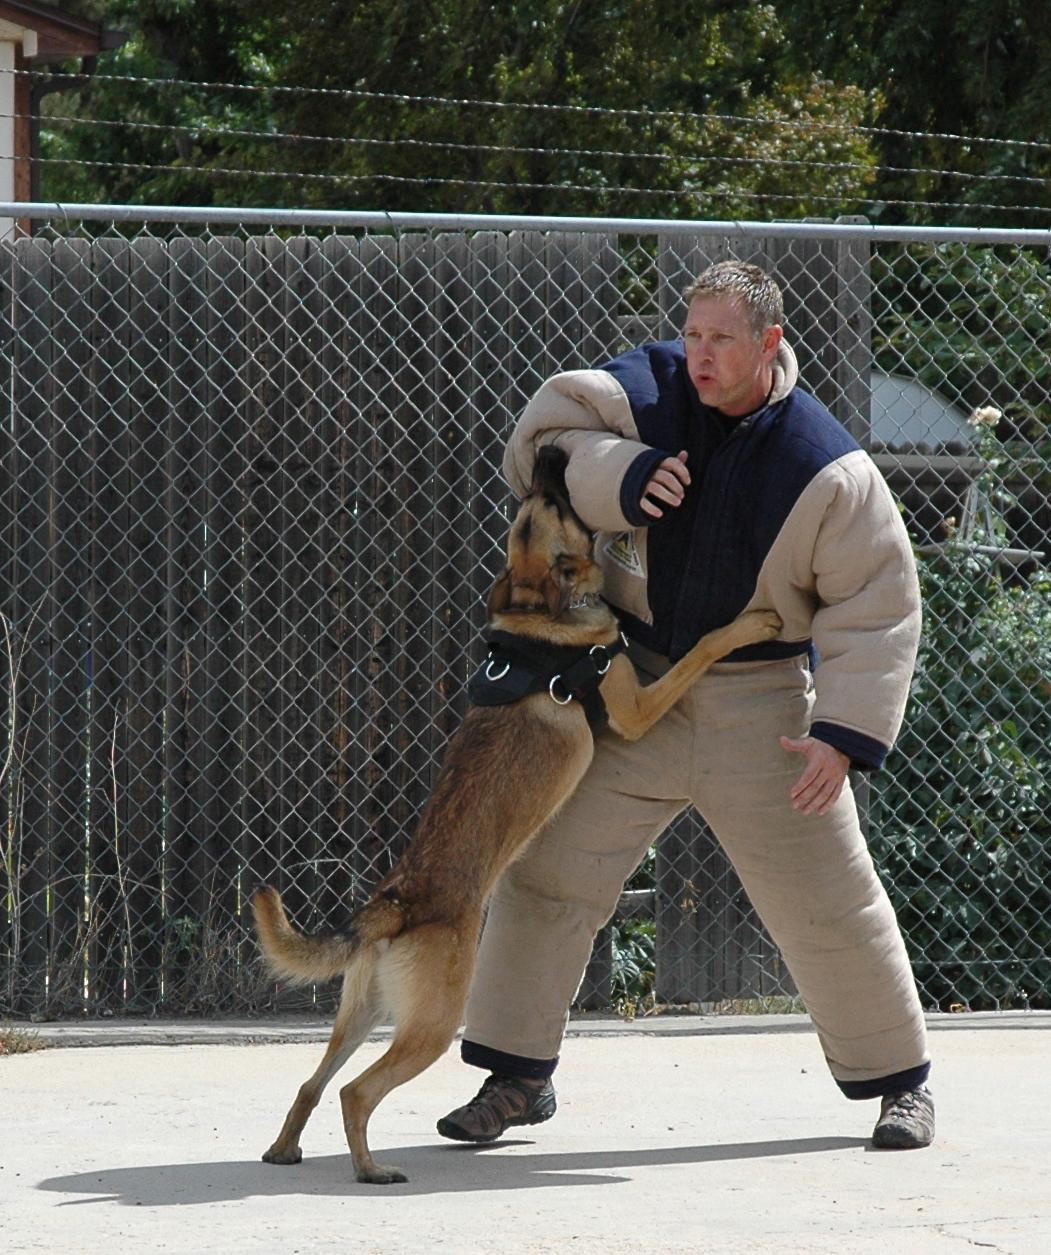 K-9 Buran takes on his target during suspect apprehension training.